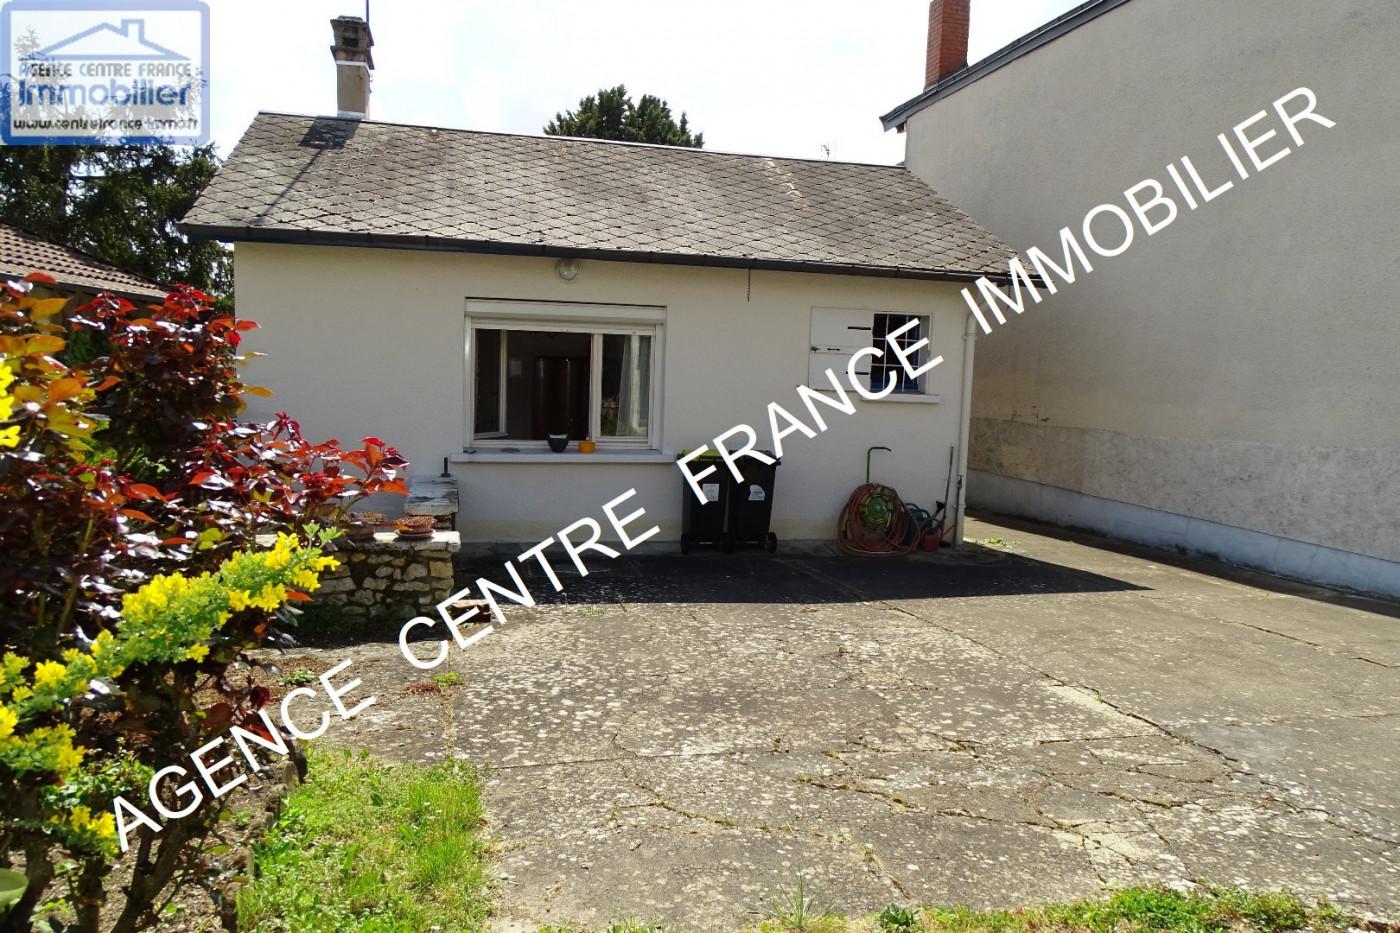 A vendre  Bourges   Réf 030011514 - Agence centre france immobilier